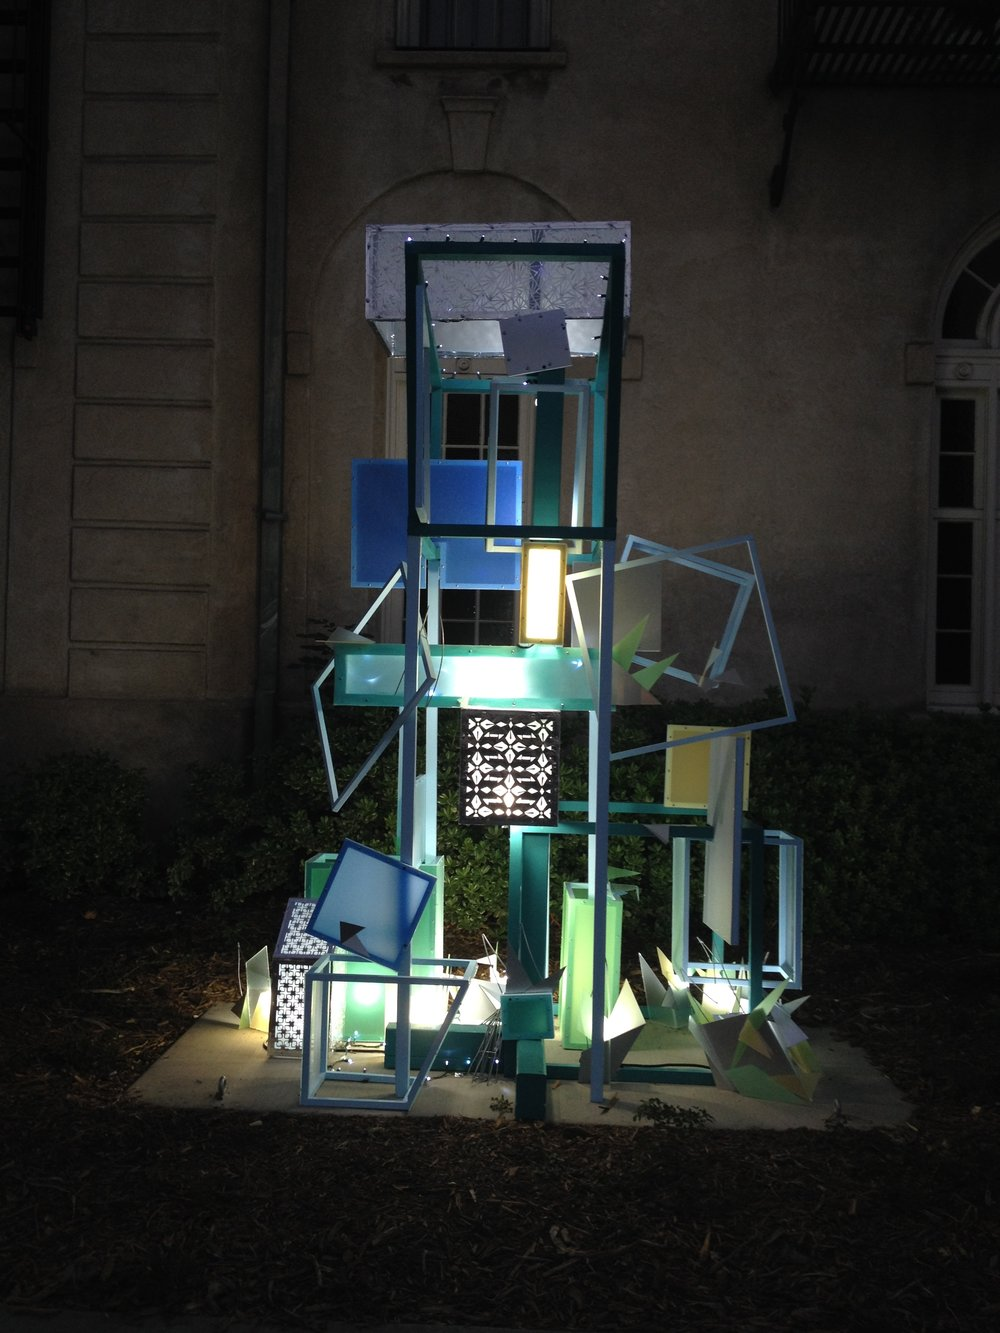 Group sculpture for the Festival of Lights in Riverside, CA December 2016